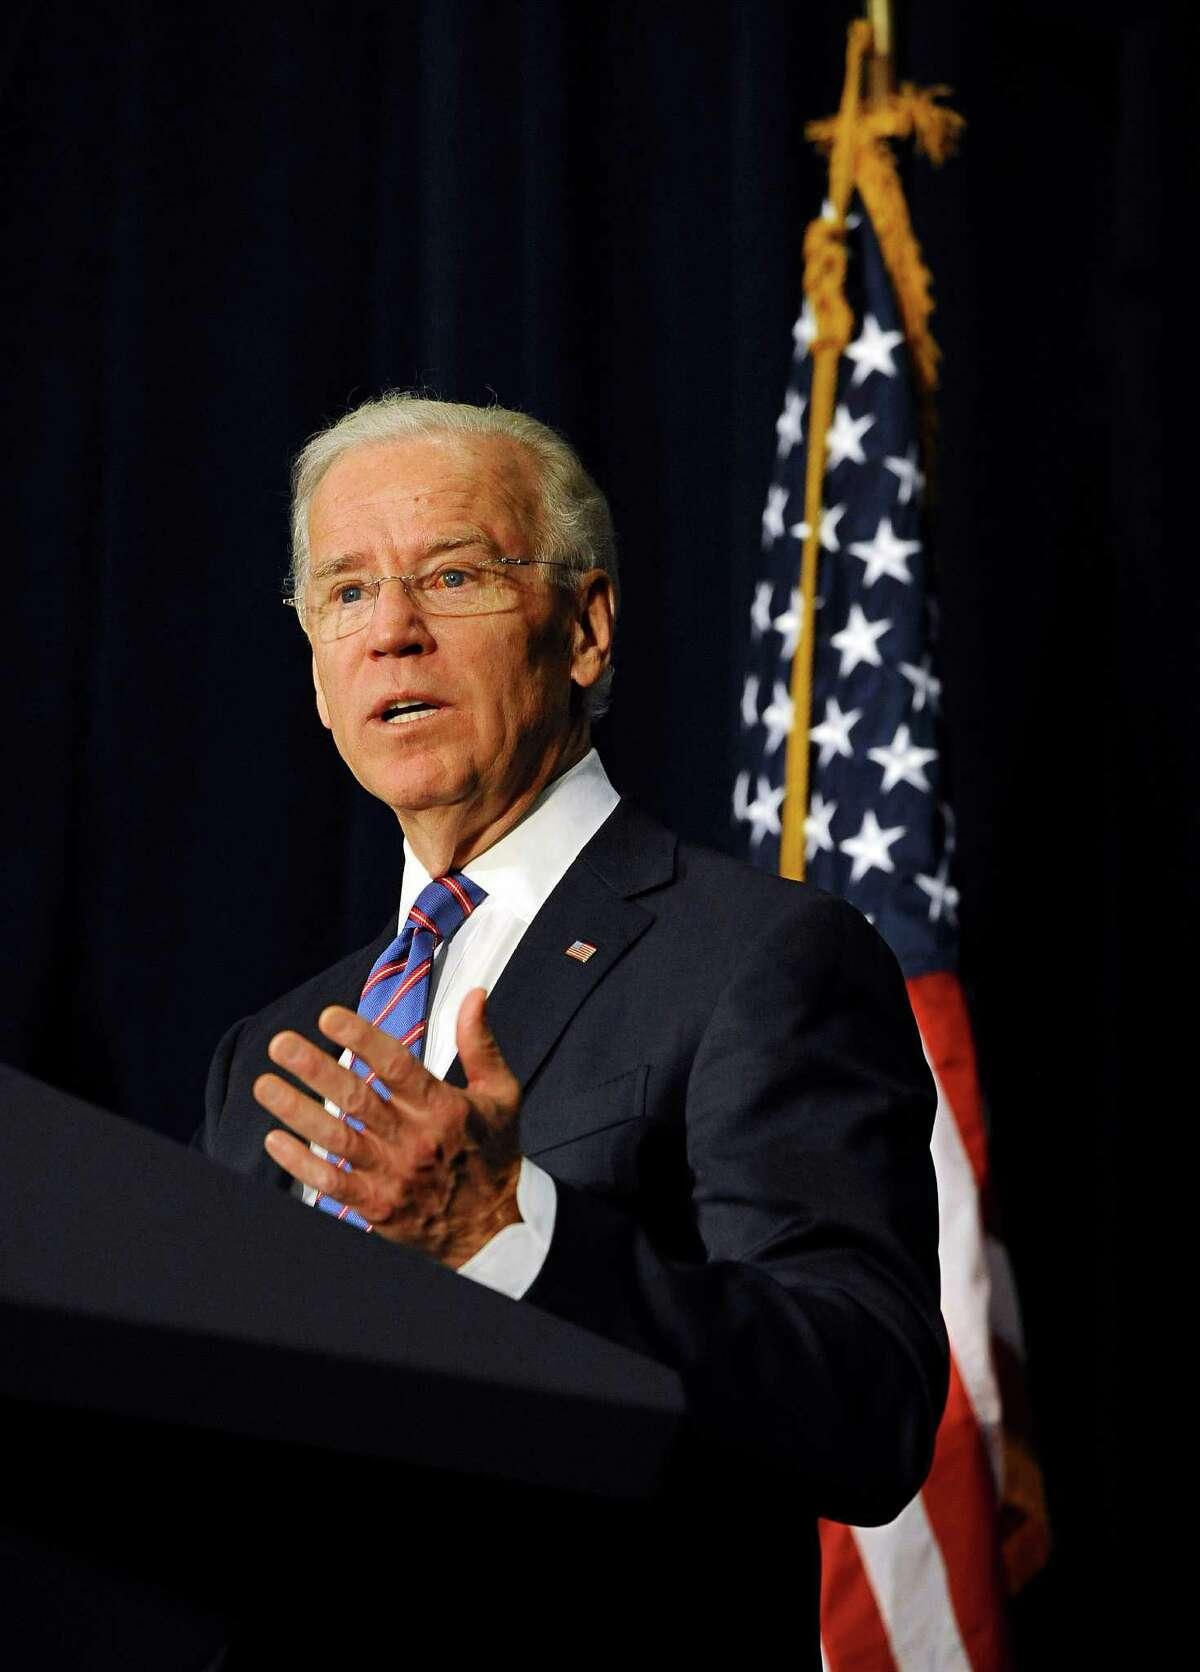 Vice President Joe Biden spoke in February at a gun violence conference in Danbury, Conn., to push President Obama's gun control proposals.